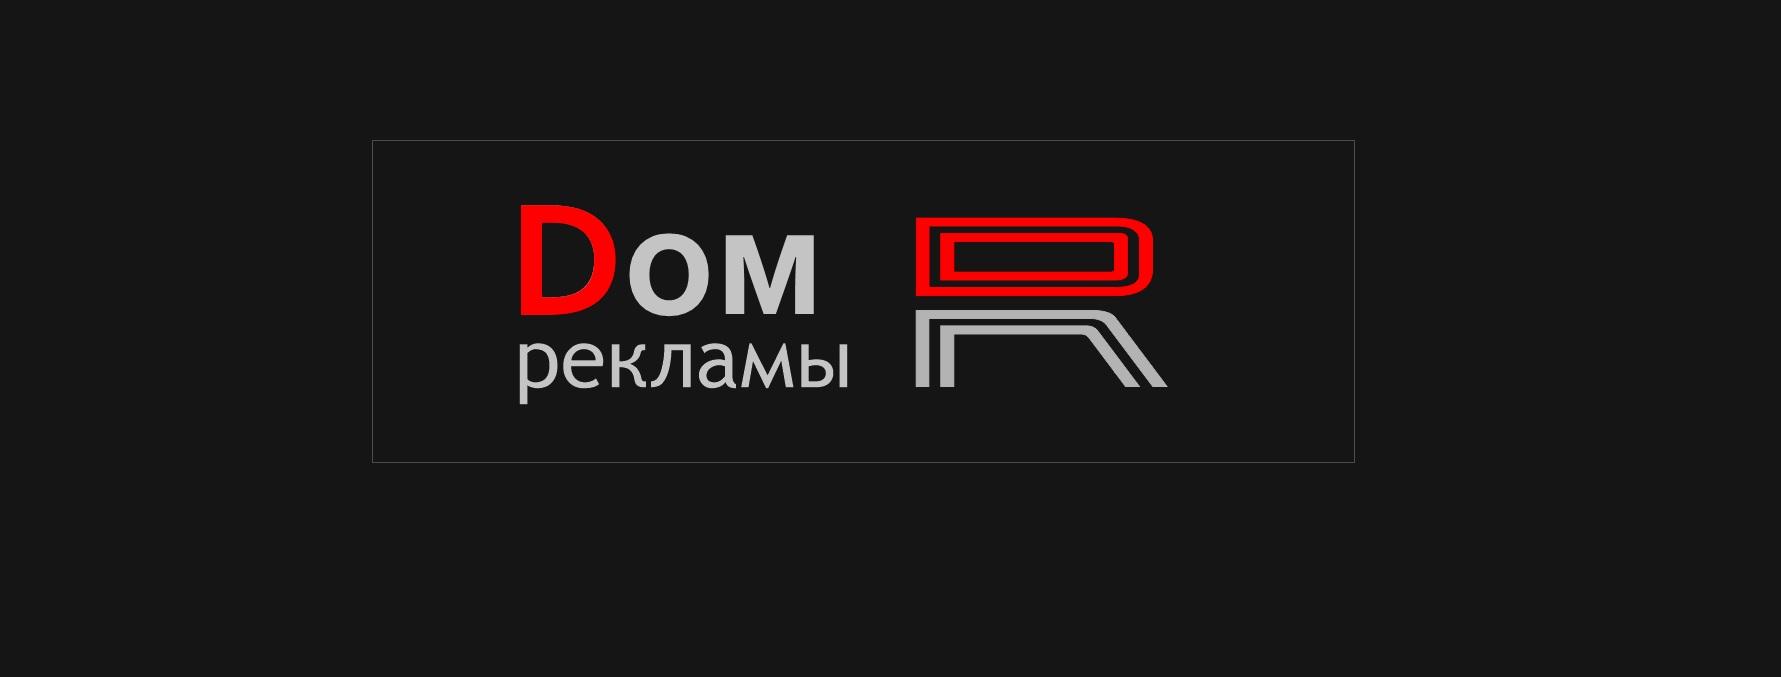 Дизайн логотипа рекламно-производственной компании фото f_9605edce339c9f44.jpg